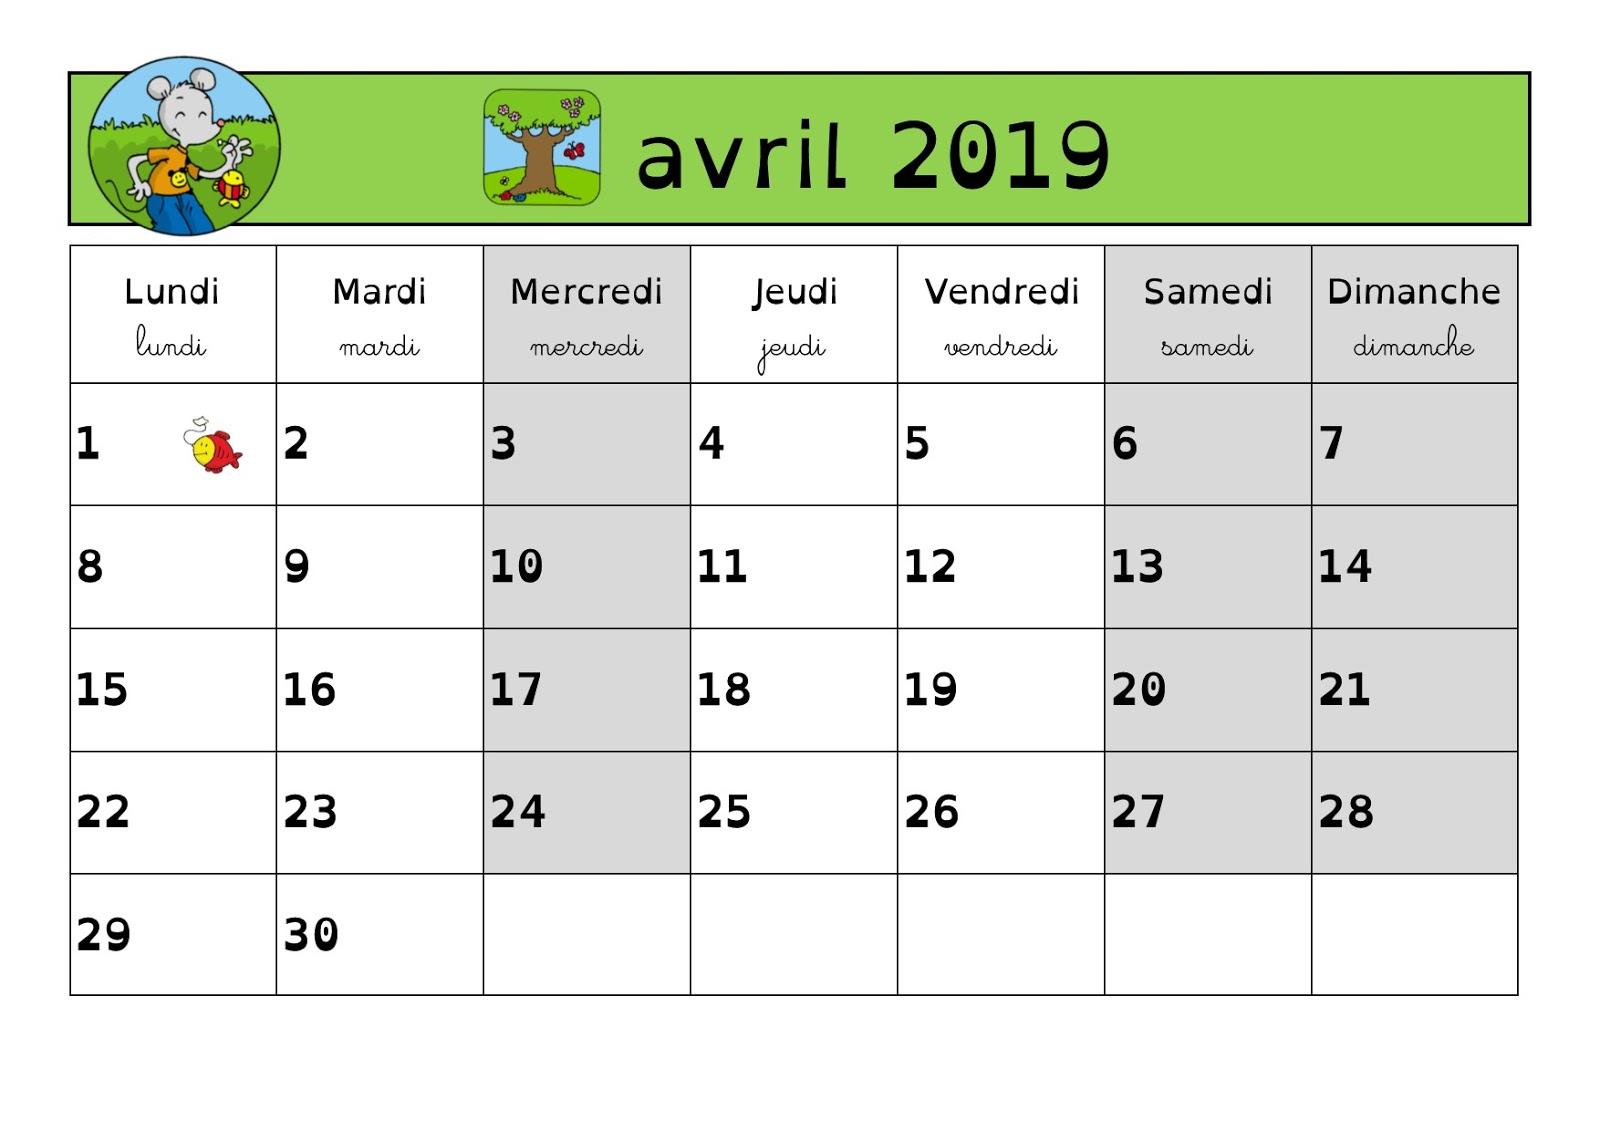 Calendrier De Mars 2019.En Classe Avec Ludo Calendrier 2018 2019 Periode 4 Mars Avril